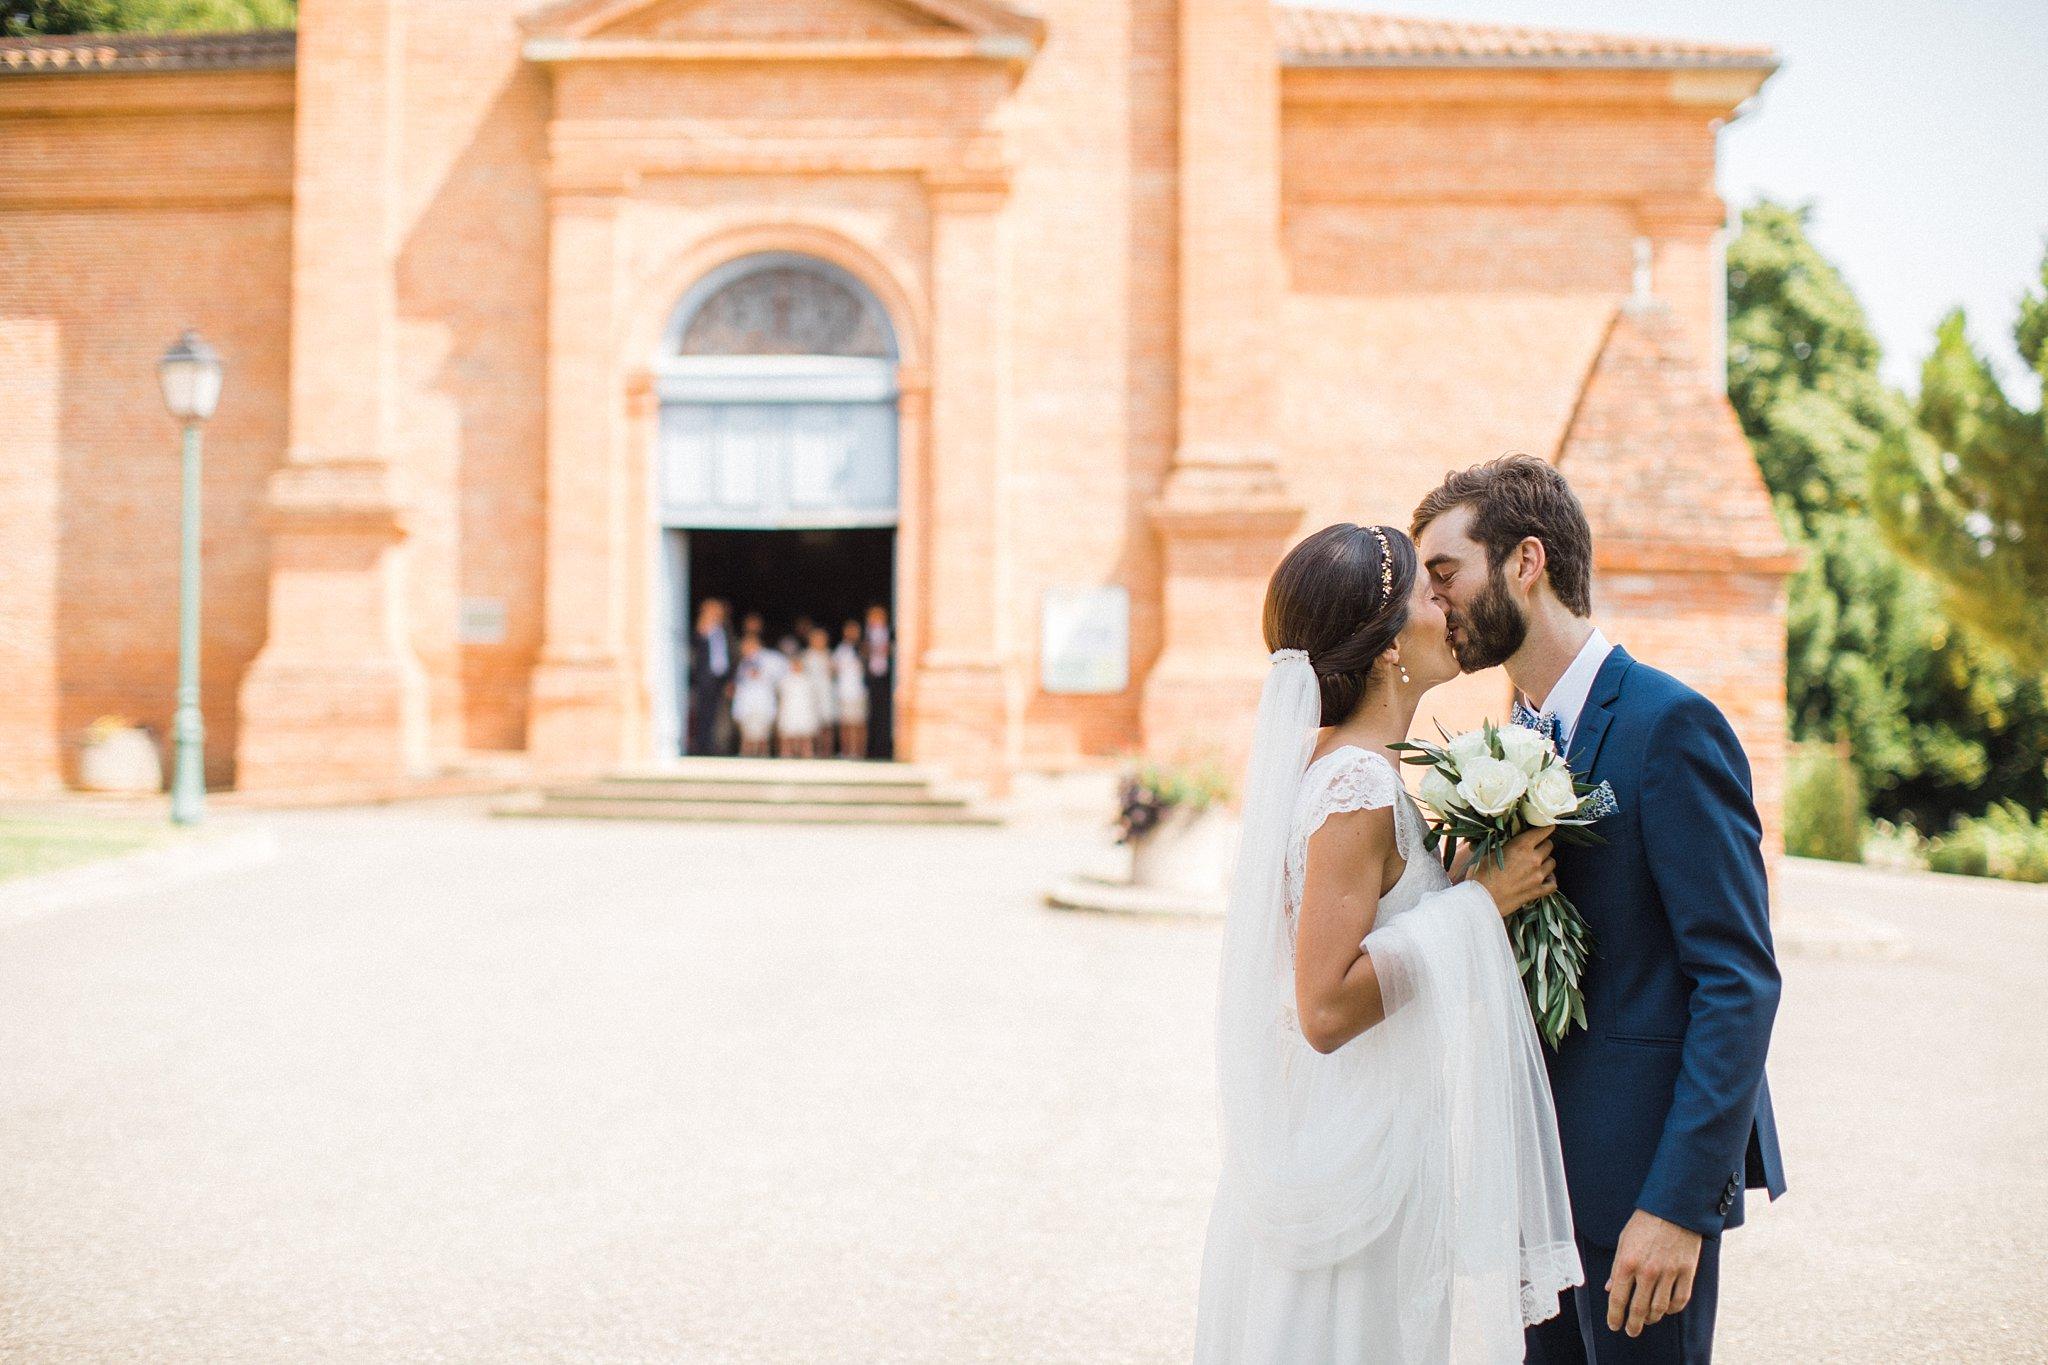 Mariage-a-la-maison-secall-hugo-hennequin-photographe-mariage-perpignan_0082.jpg